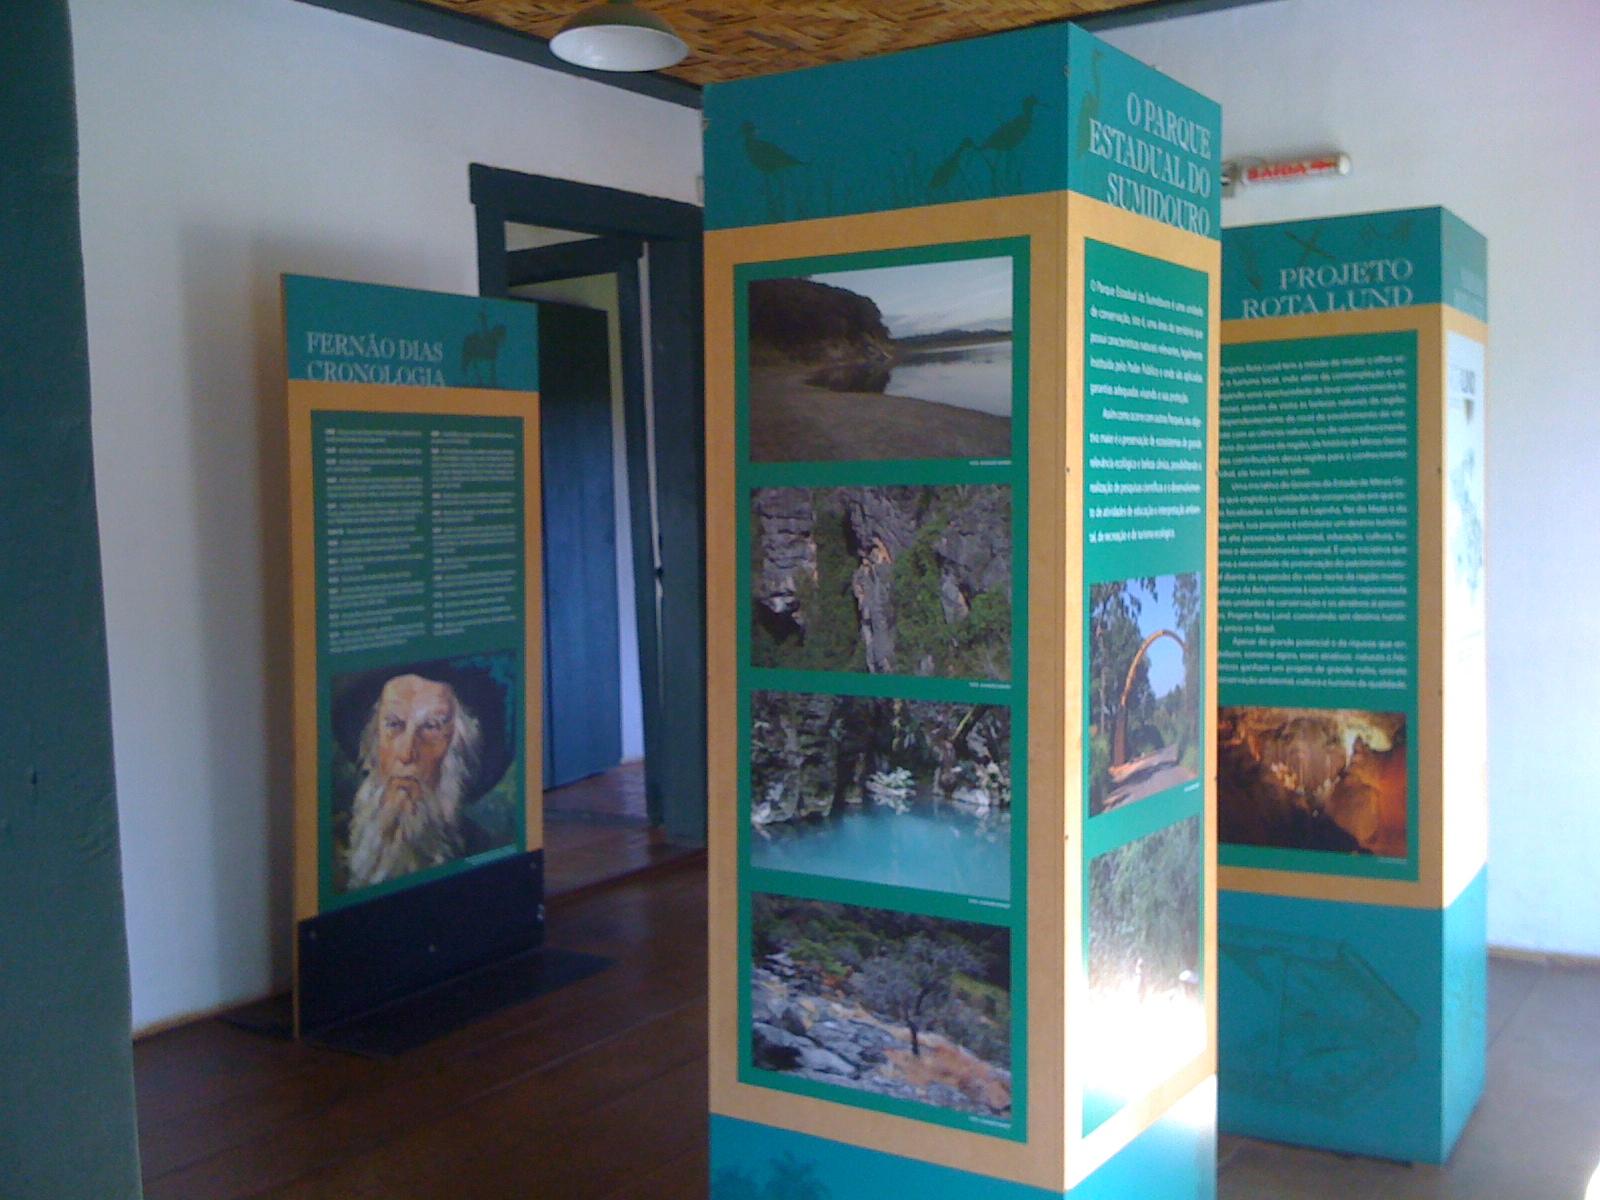 LIONS VISITA LC QUINTA DO SUMIDOURO 003